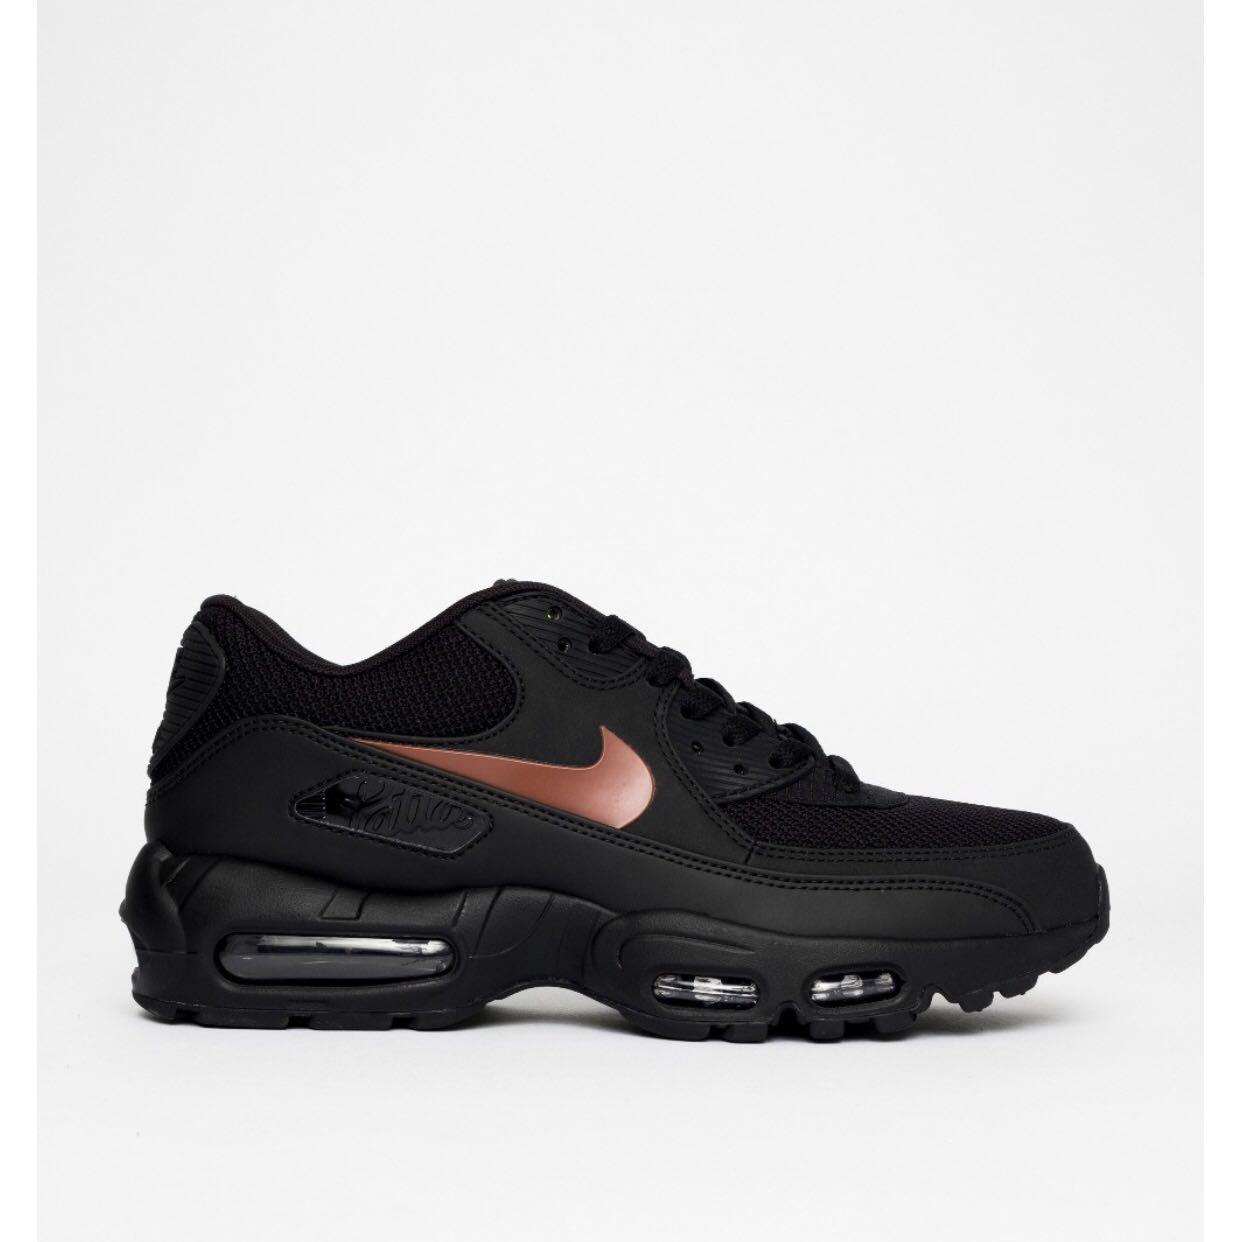 buy popular 6b499 d6311 Nike x PATTA Air Max 90/95 US9, Men's Fashion, Footwear ...